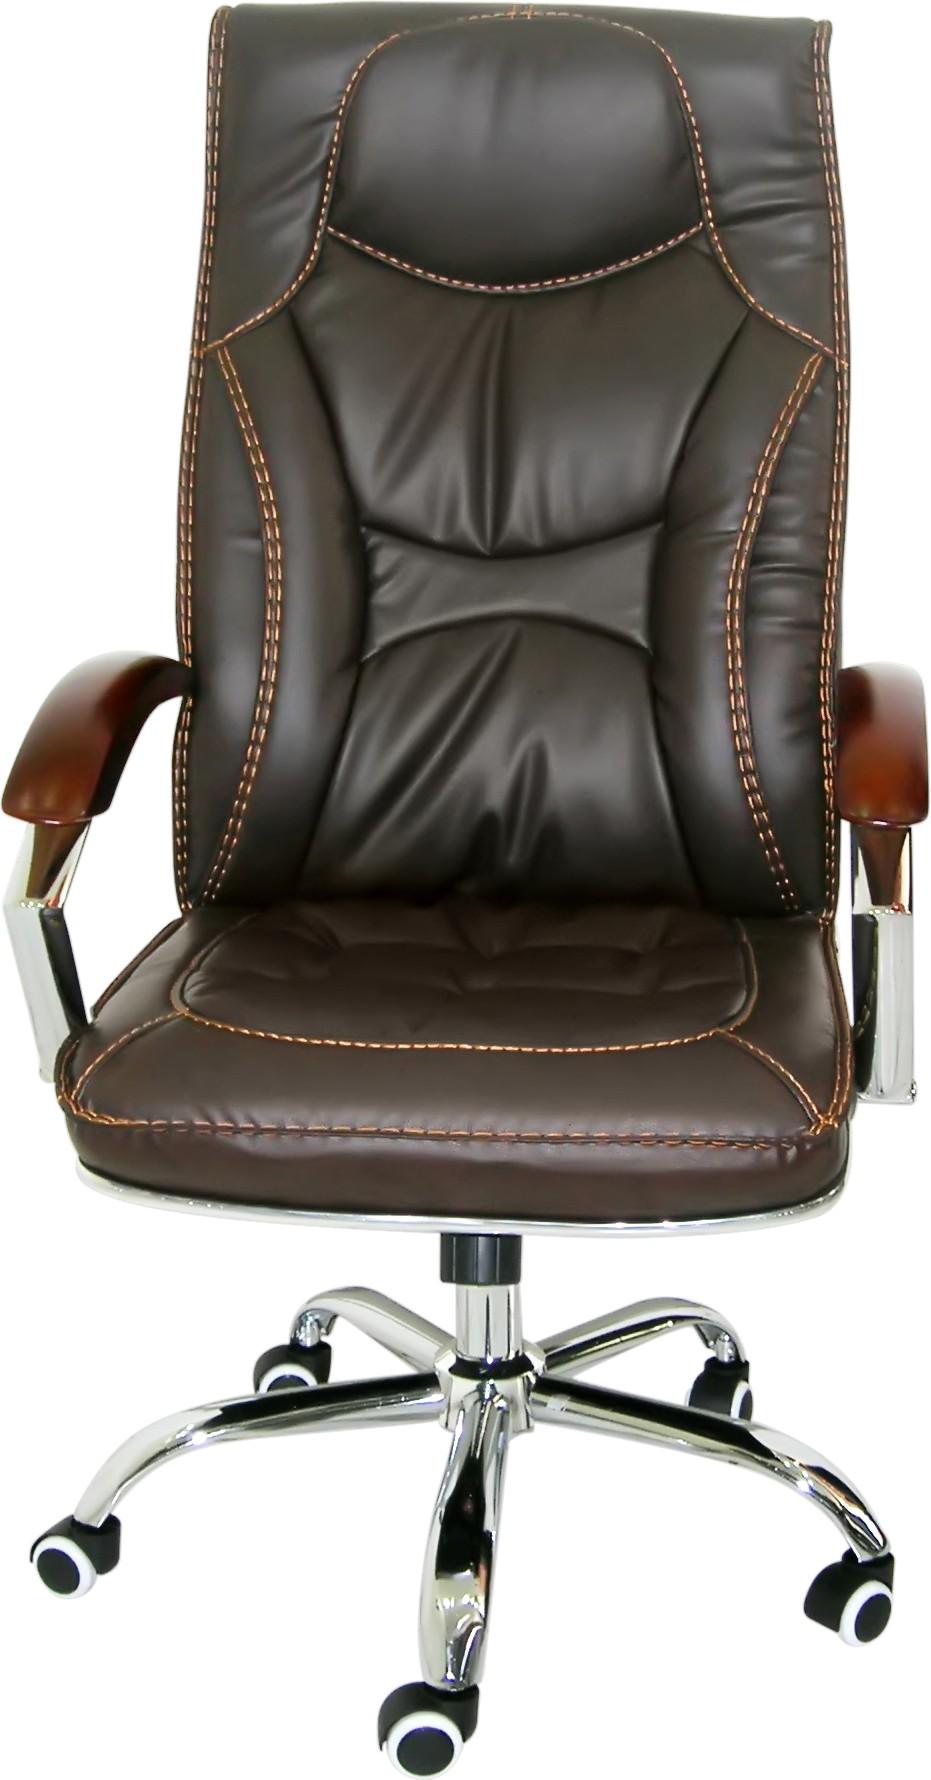 Comfort-line Metal Office Chair class=